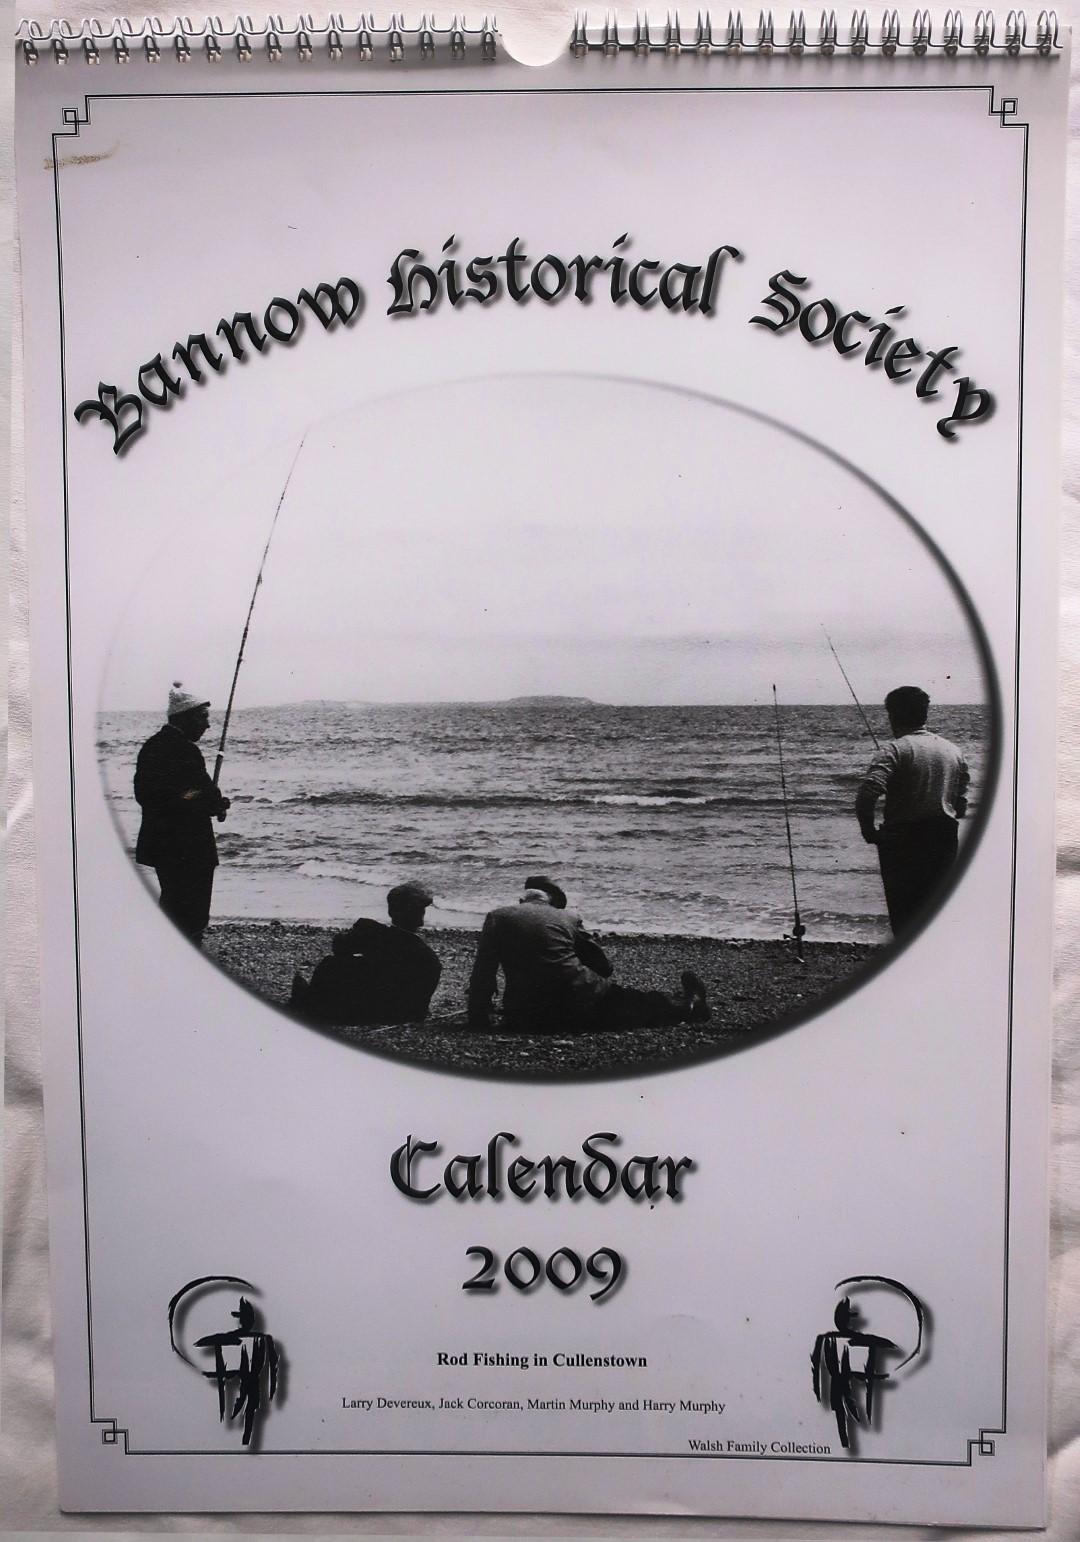 Bannow Historical Society Calendar 2009